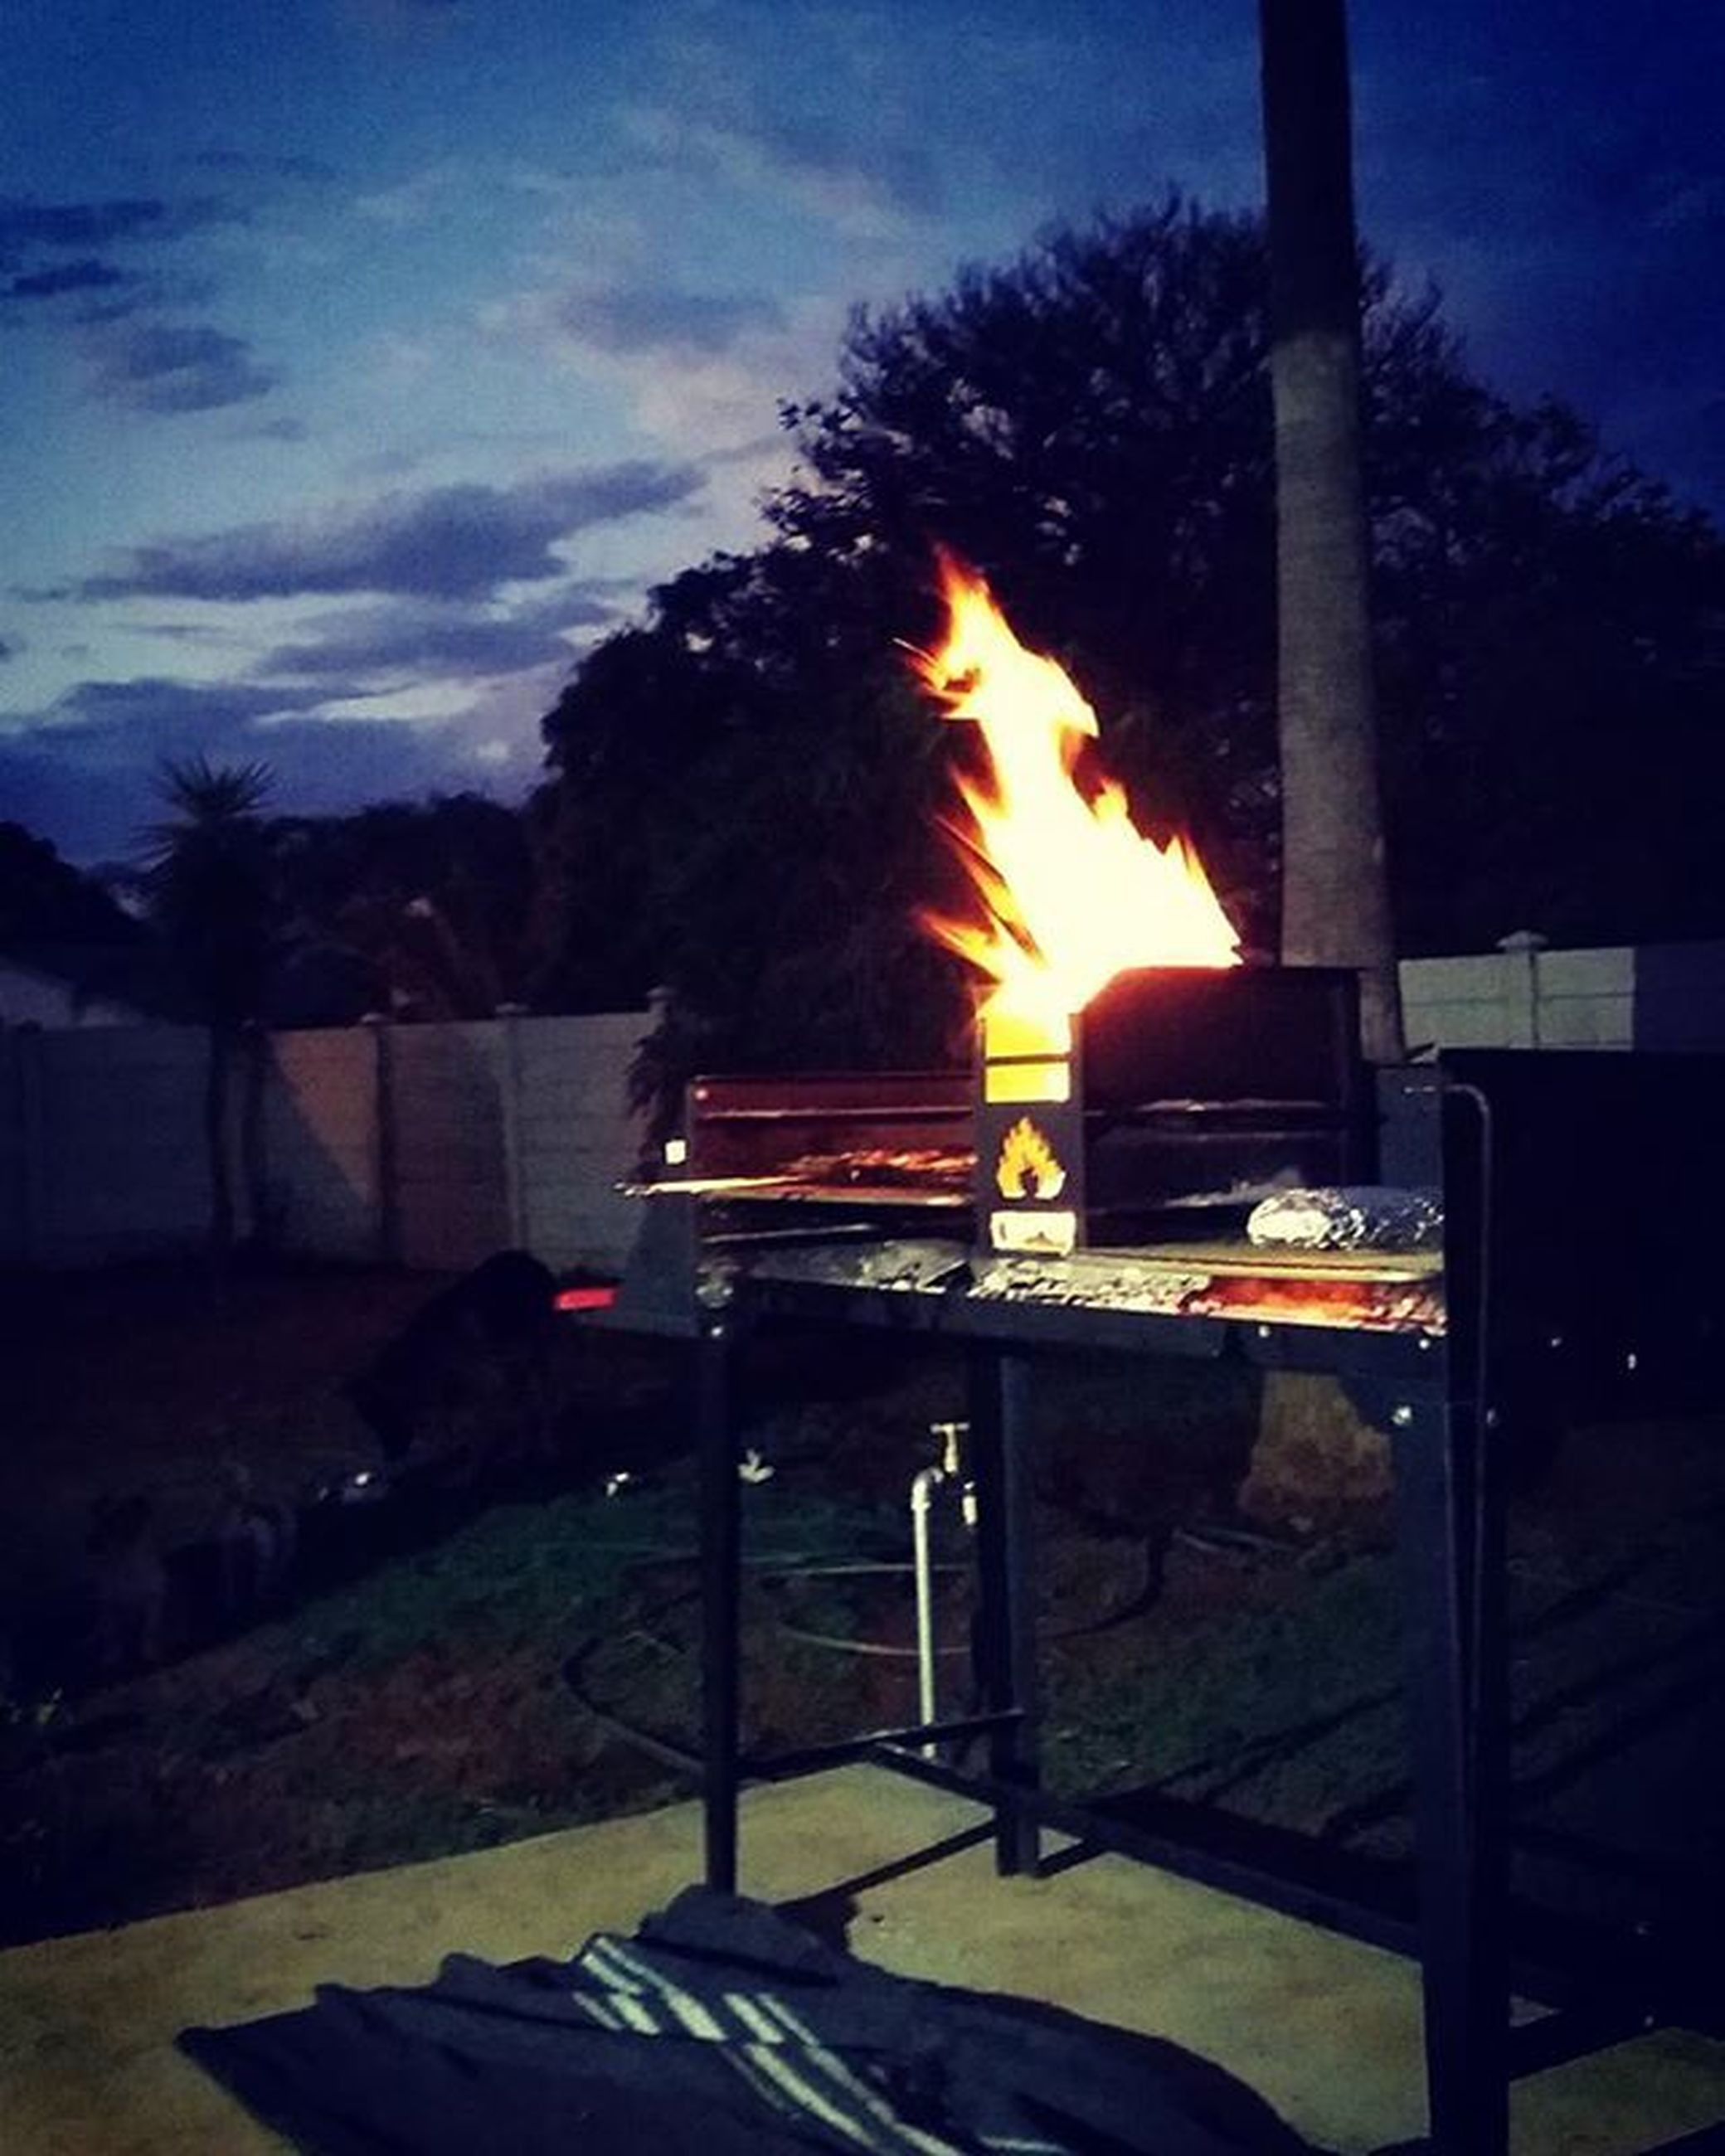 flame, burning, fire - natural phenomenon, heat - temperature, glowing, sunset, fire, night, firewood, bonfire, wood - material, sunlight, illuminated, orange color, sunbeam, sun, dark, silhouette, outdoors, bench